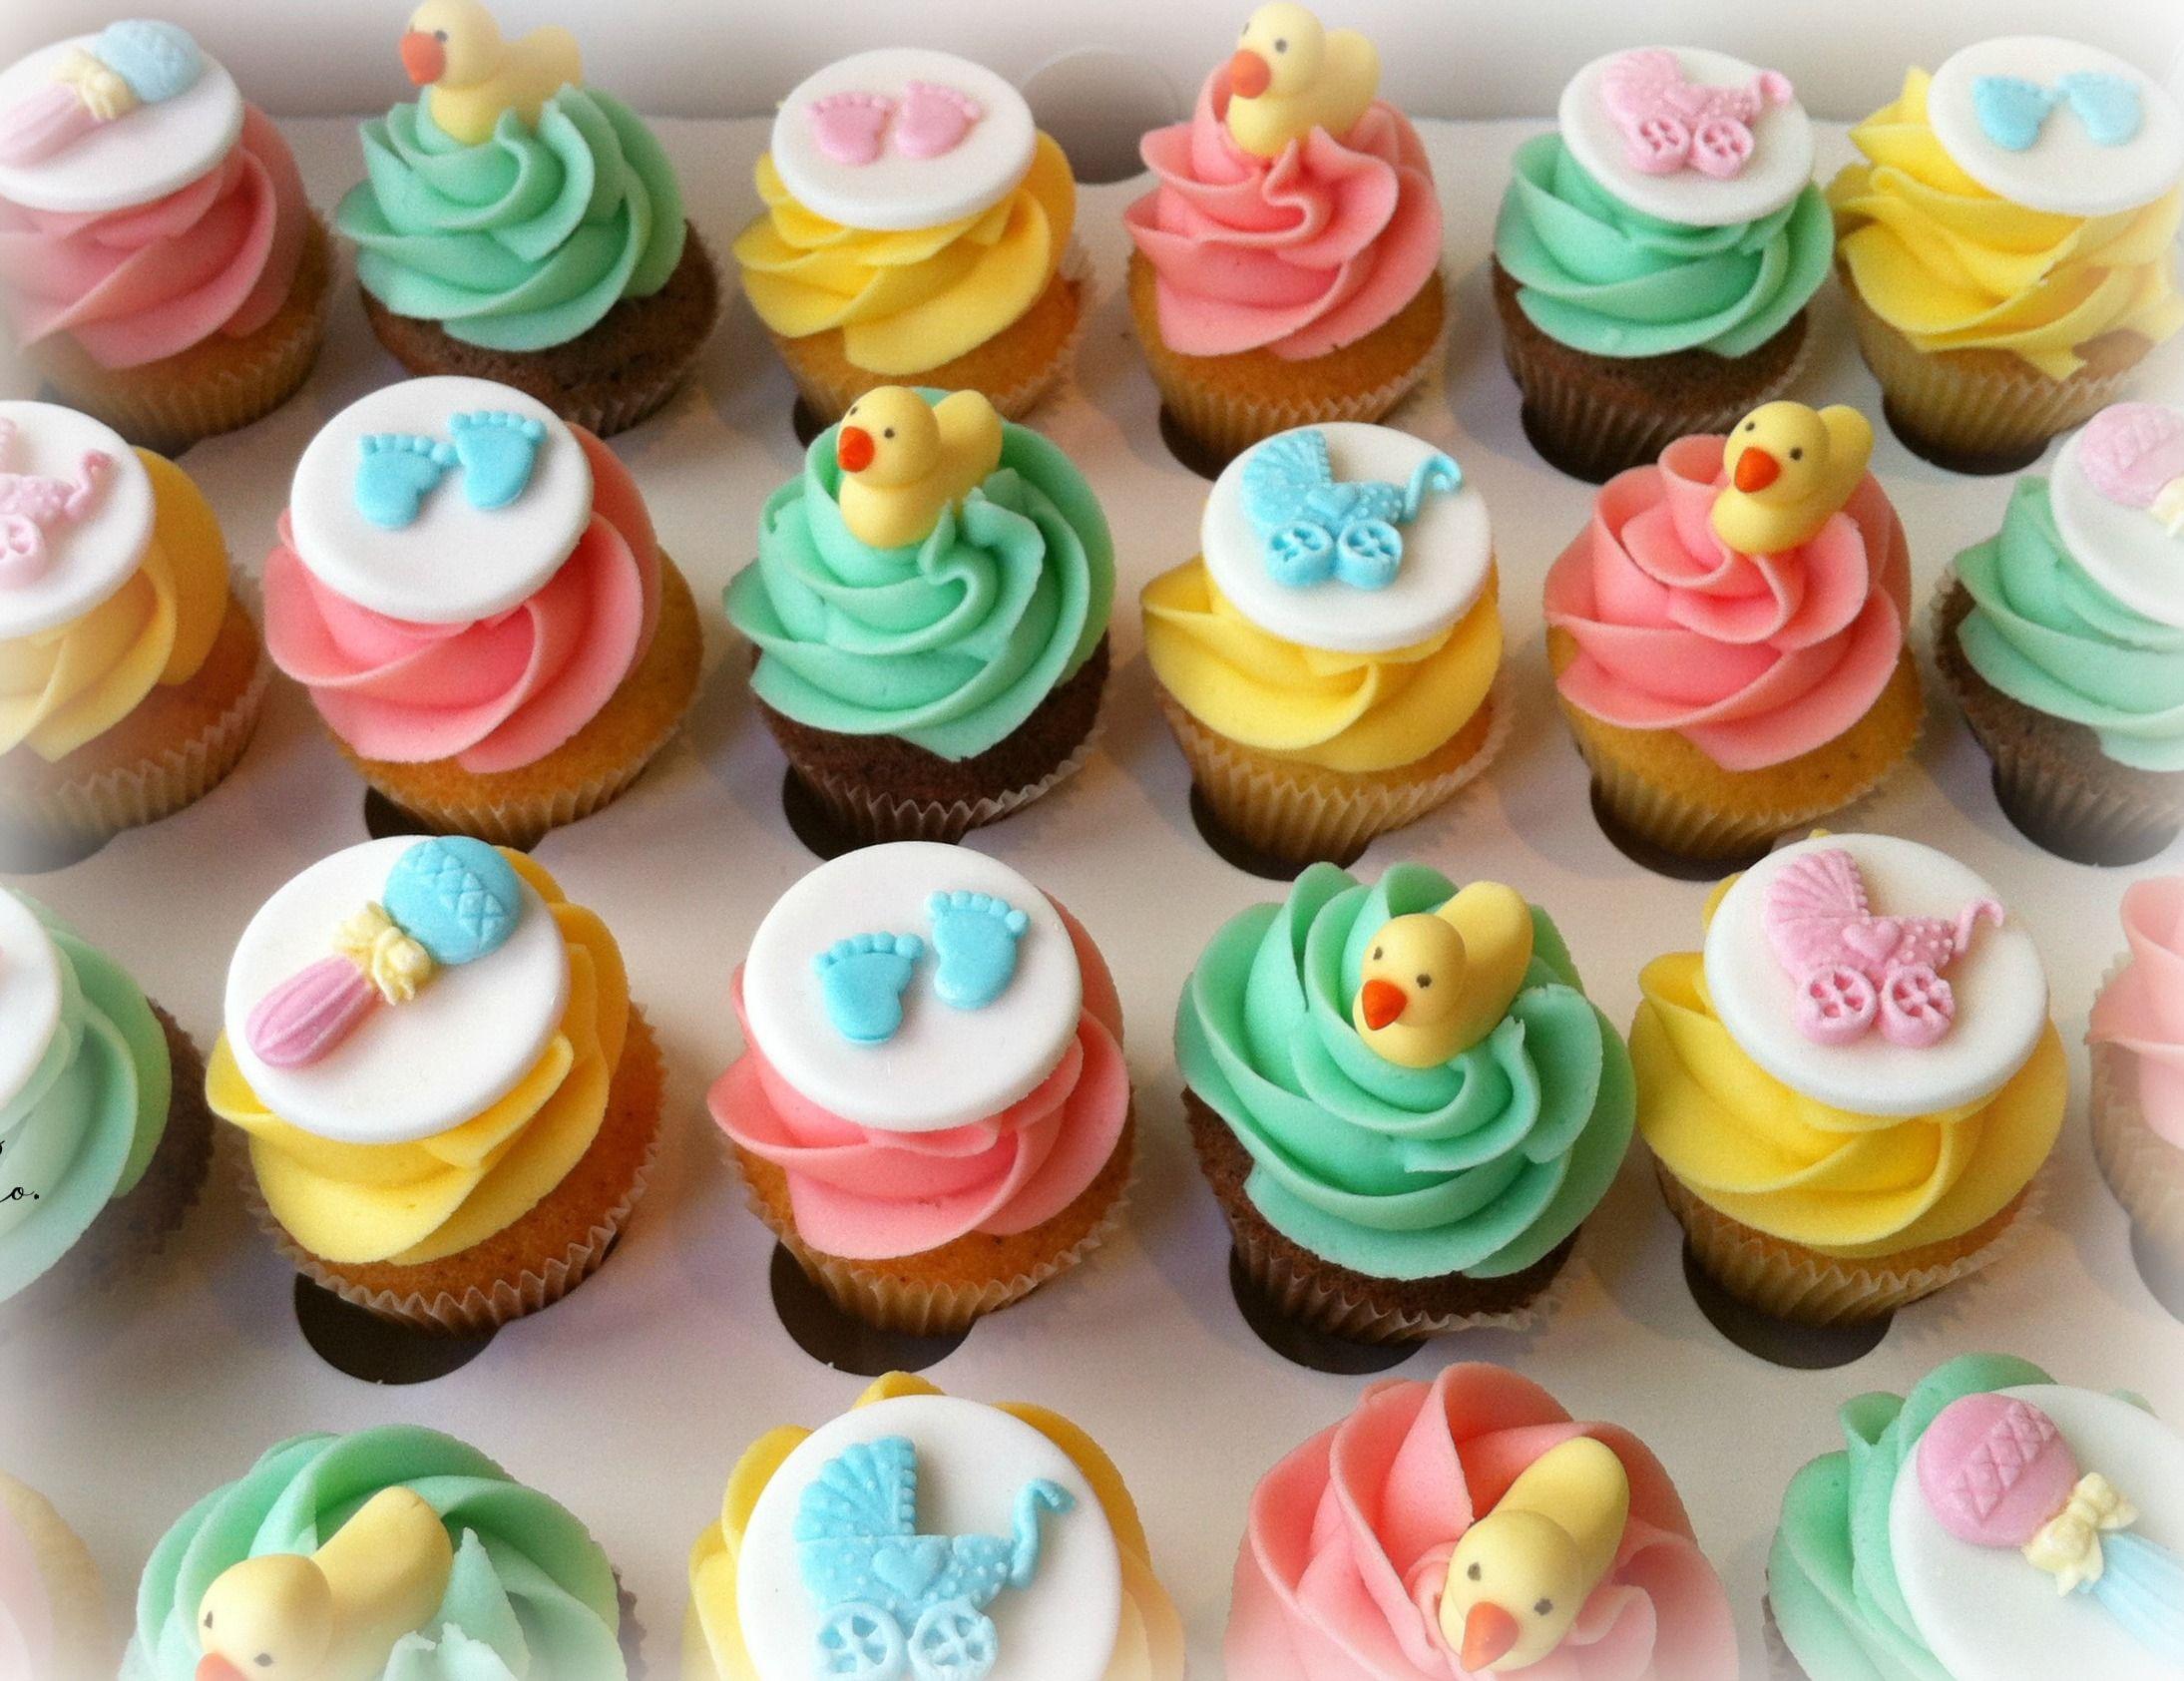 Baby shower mini cupcakes....